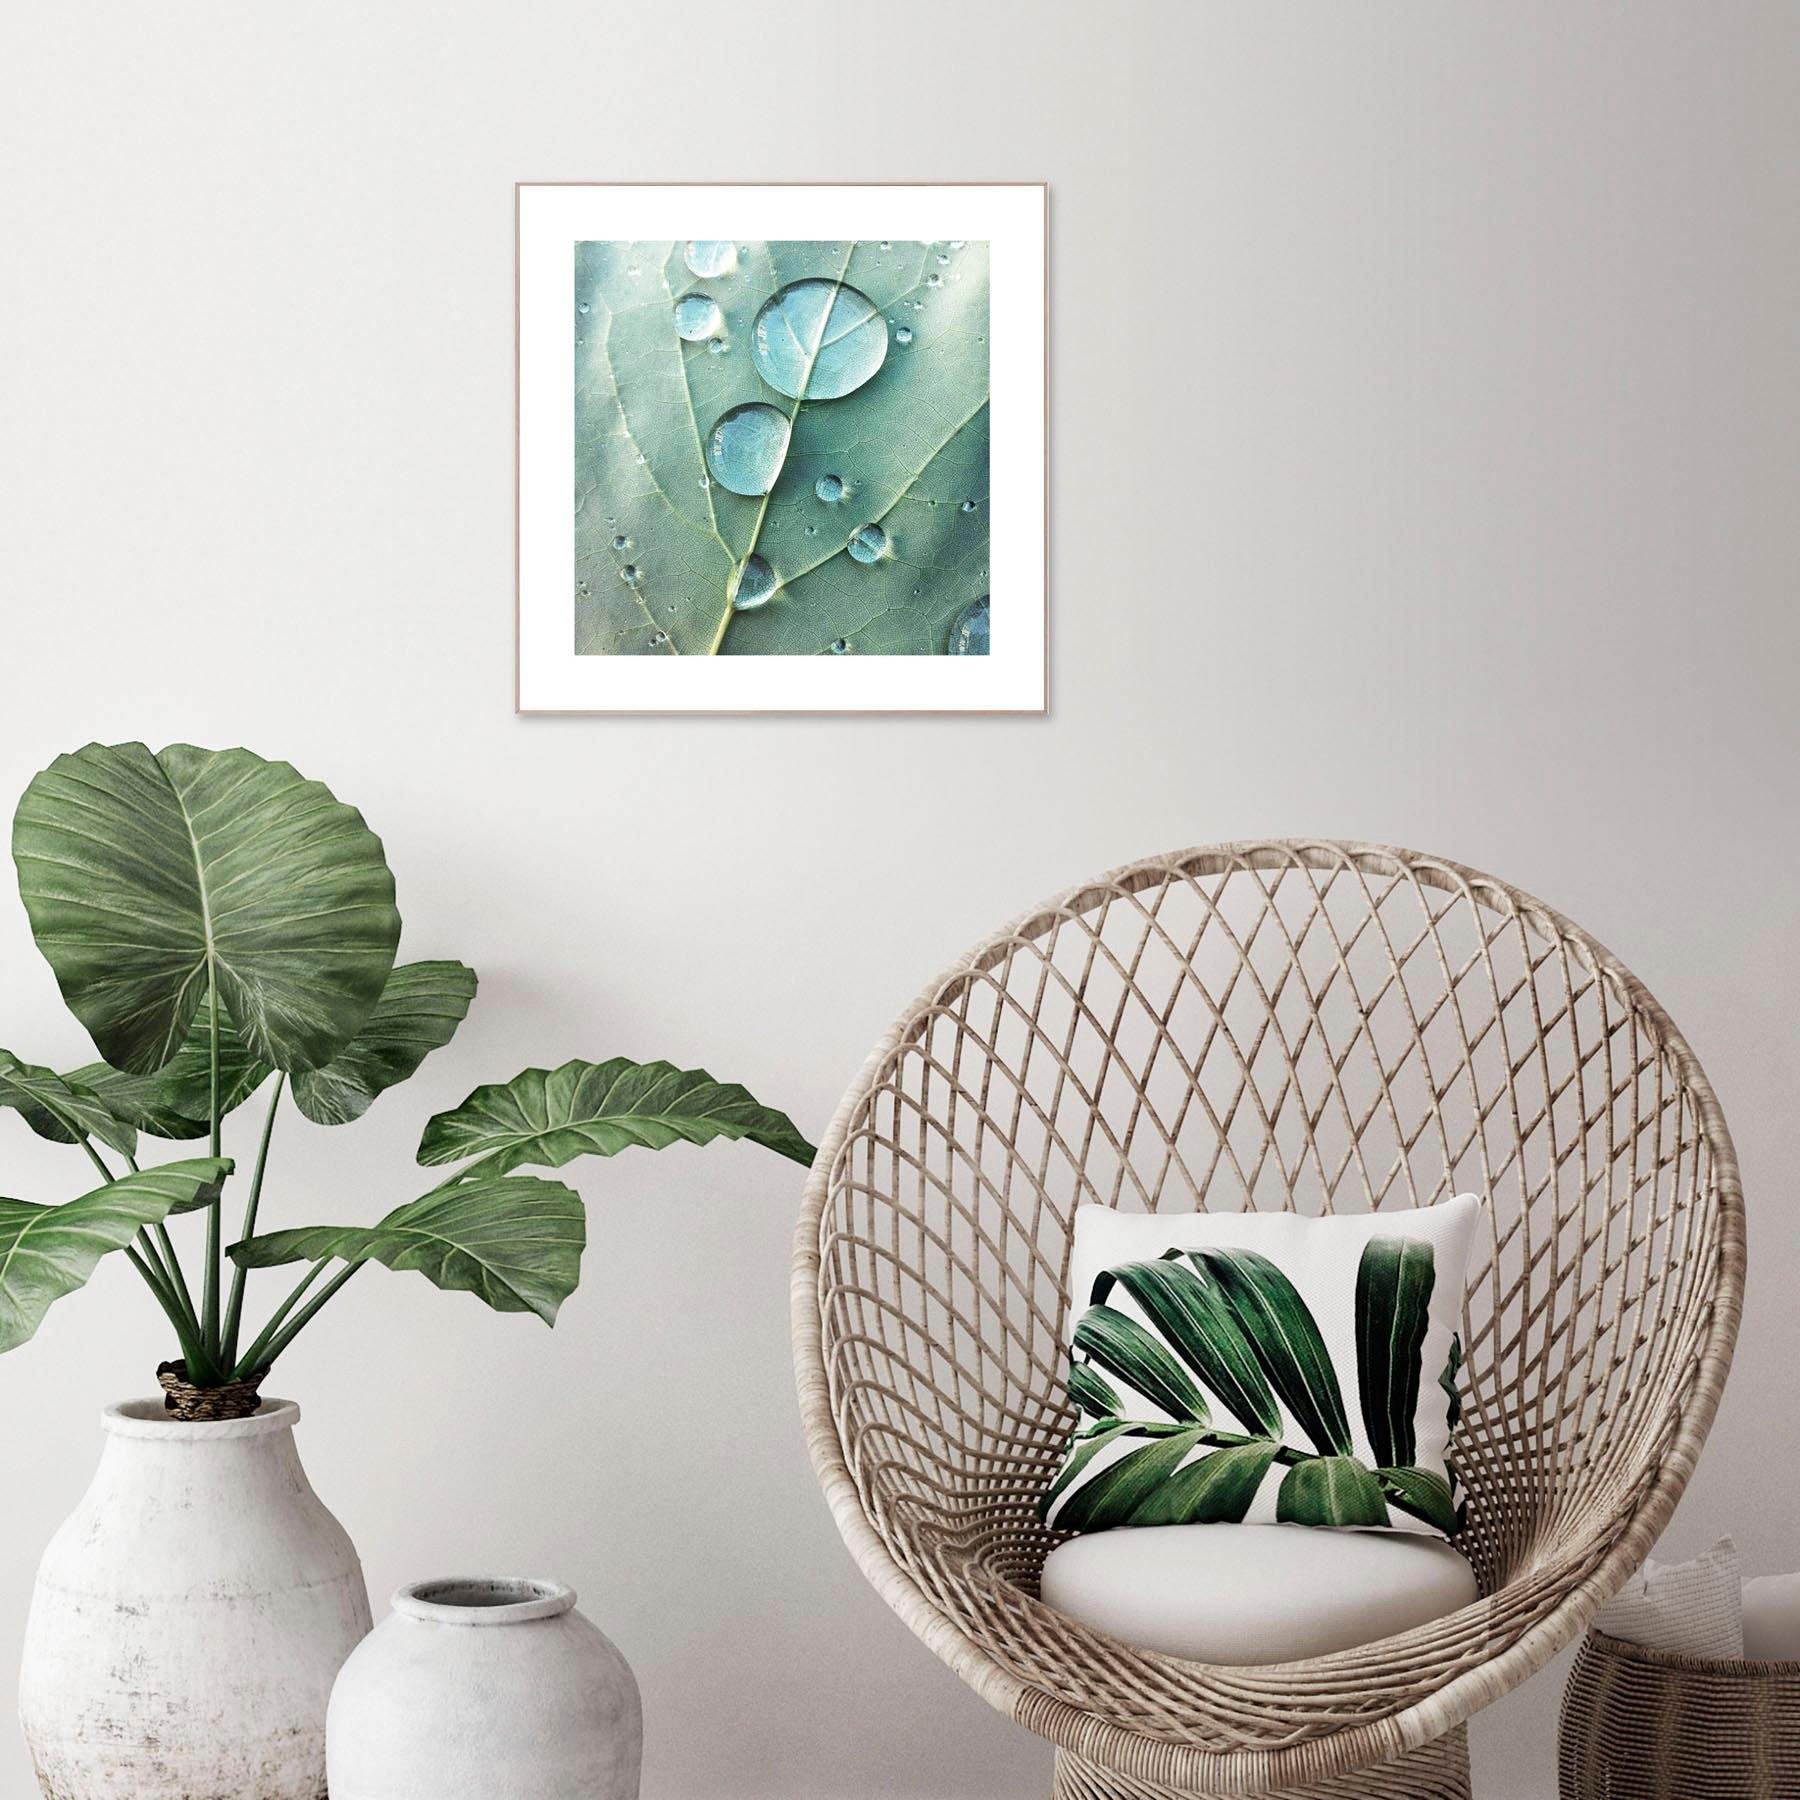 Reinders! artprint Slim Frame Wood 50x50 Dew Drops - verschillende betaalmethodes